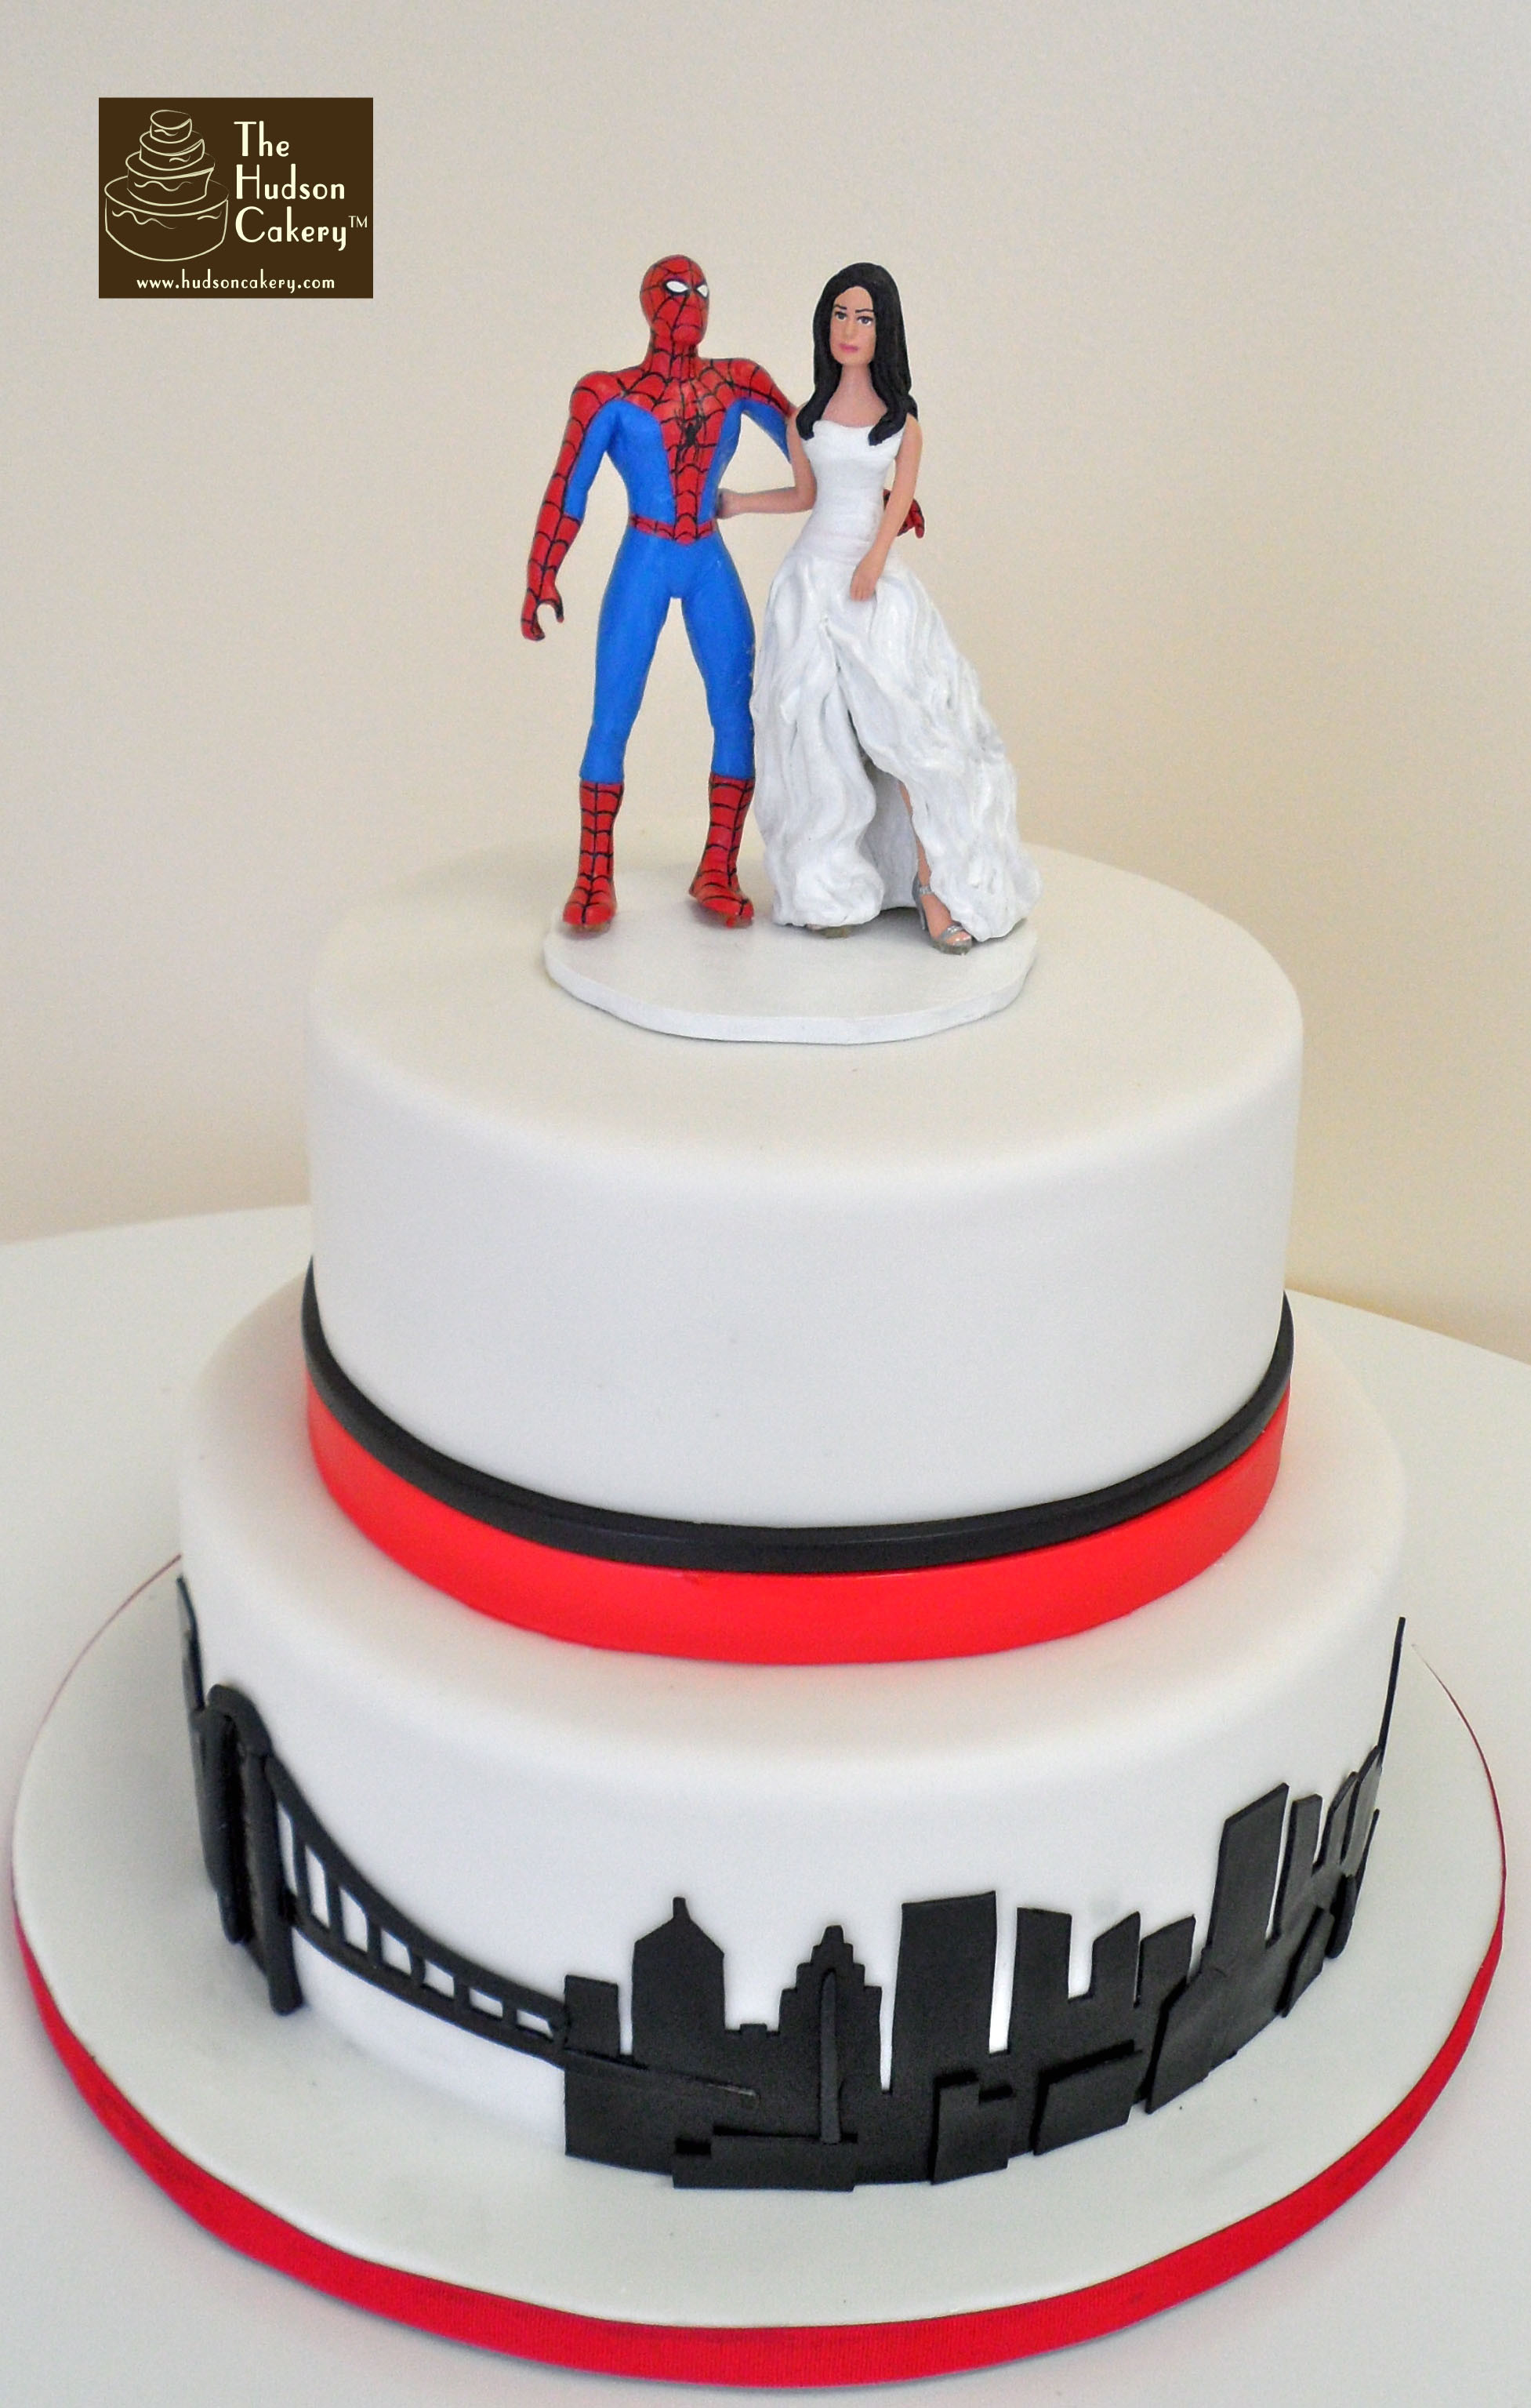 Spiderman Wedding Cakes  wedding cake toppers Initials For Wedding Cake Toppers